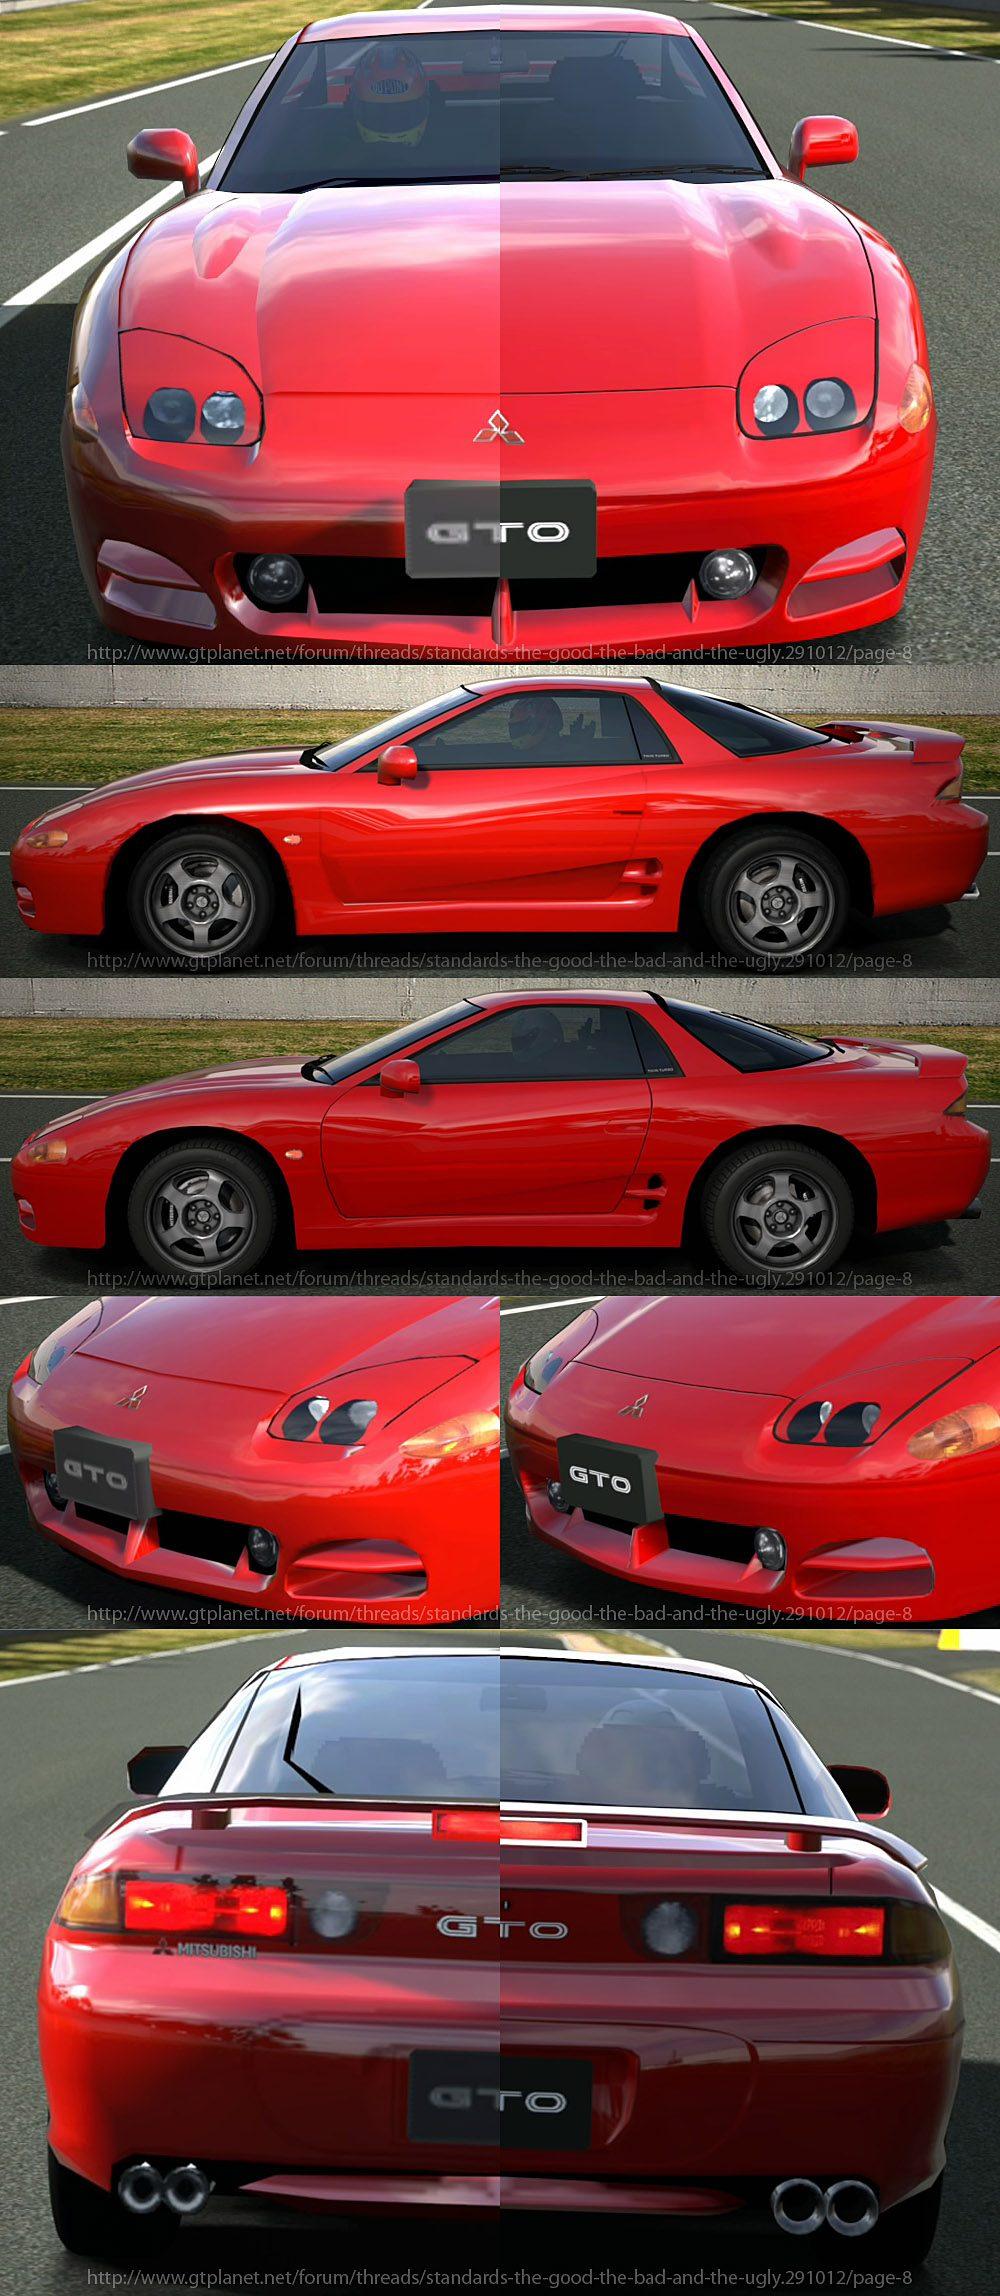 GTO-95_041.jpg